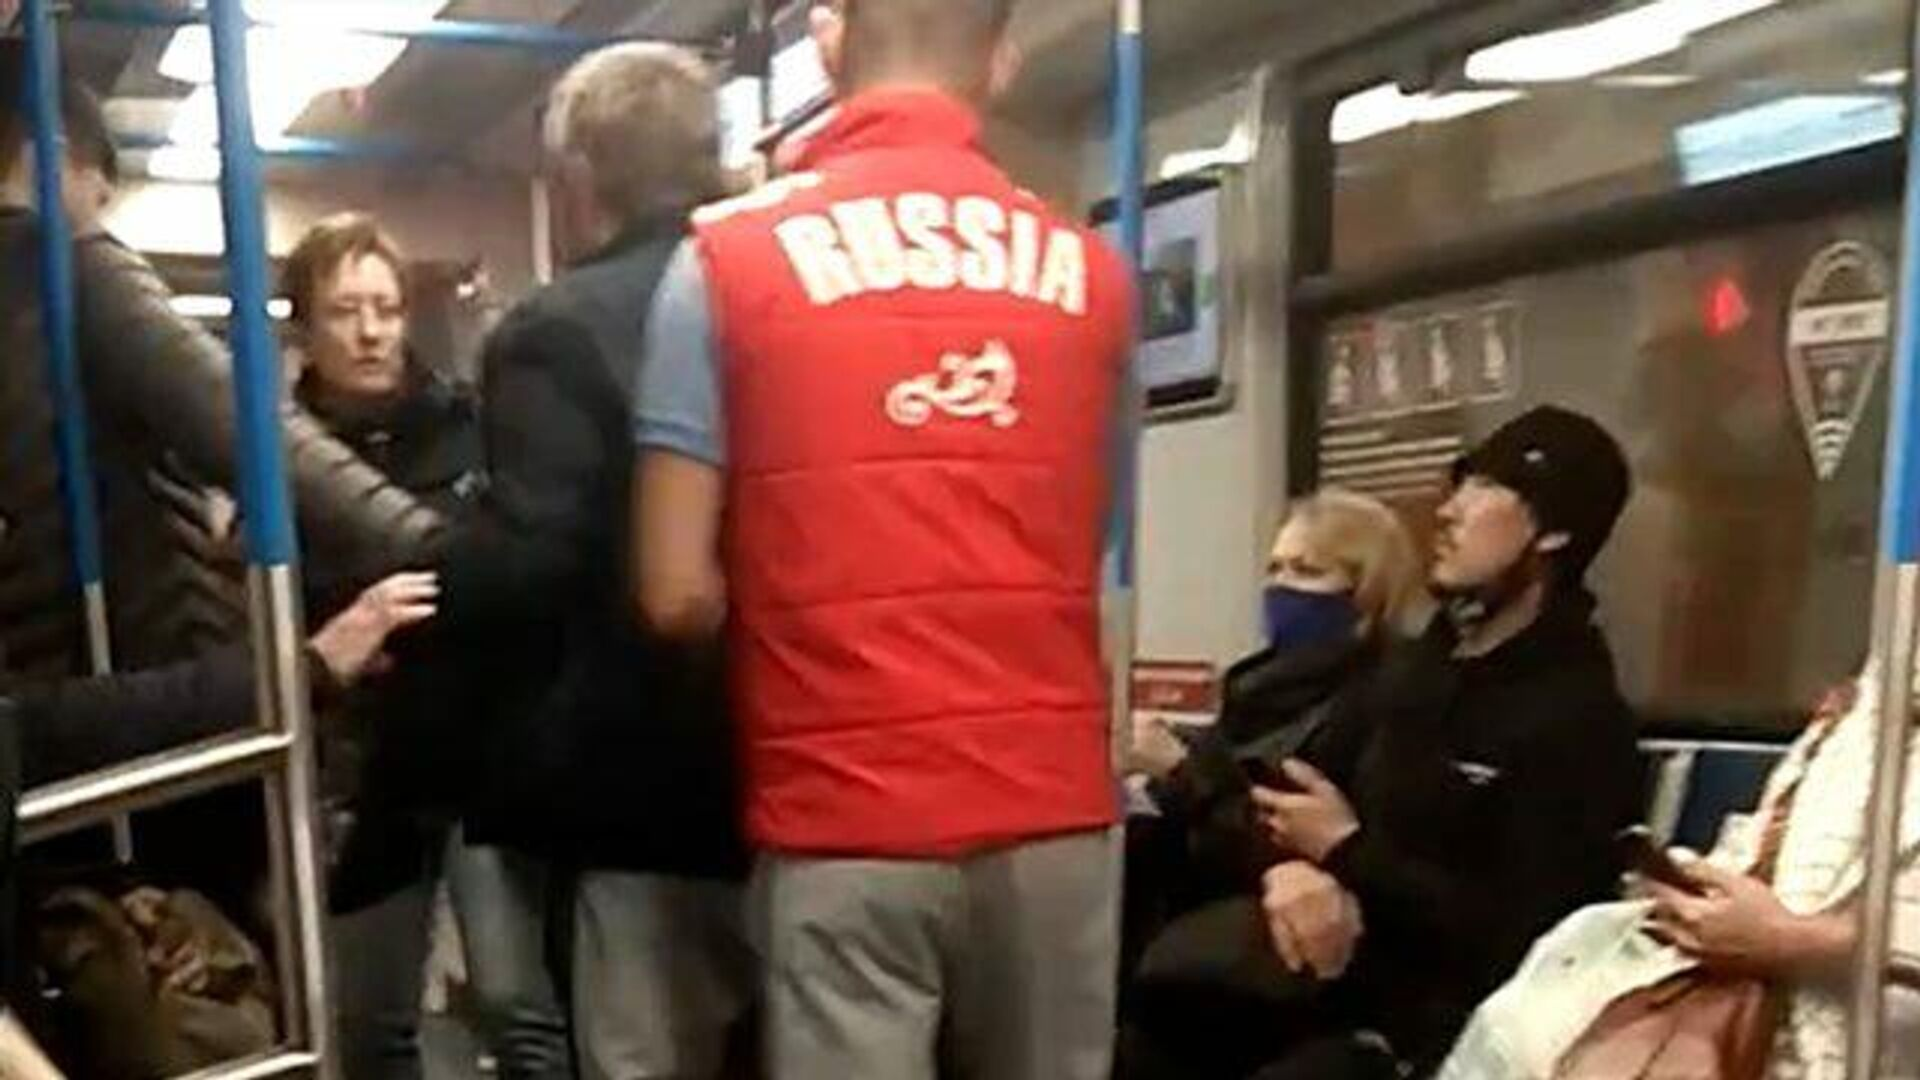 Мужчина набросился на женщину в метро из-за кашля  - РИА Новости, 1920, 05.10.2020